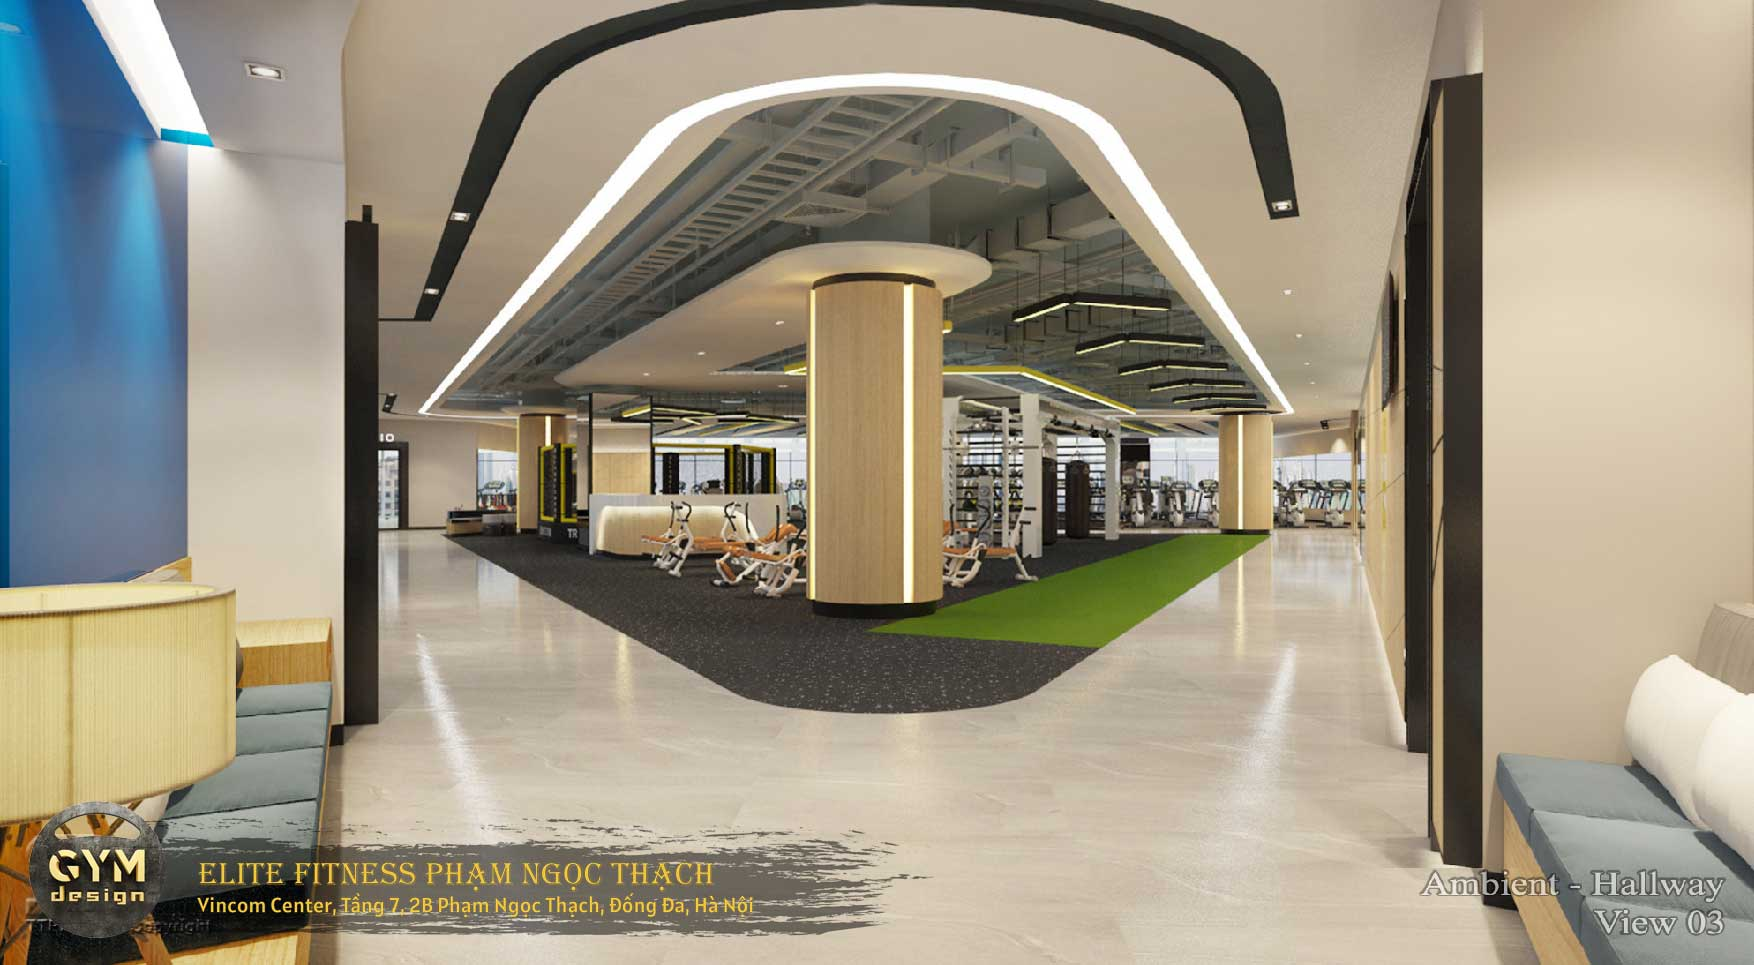 du-an-elite-fitness-pham-ngoc-thach-54